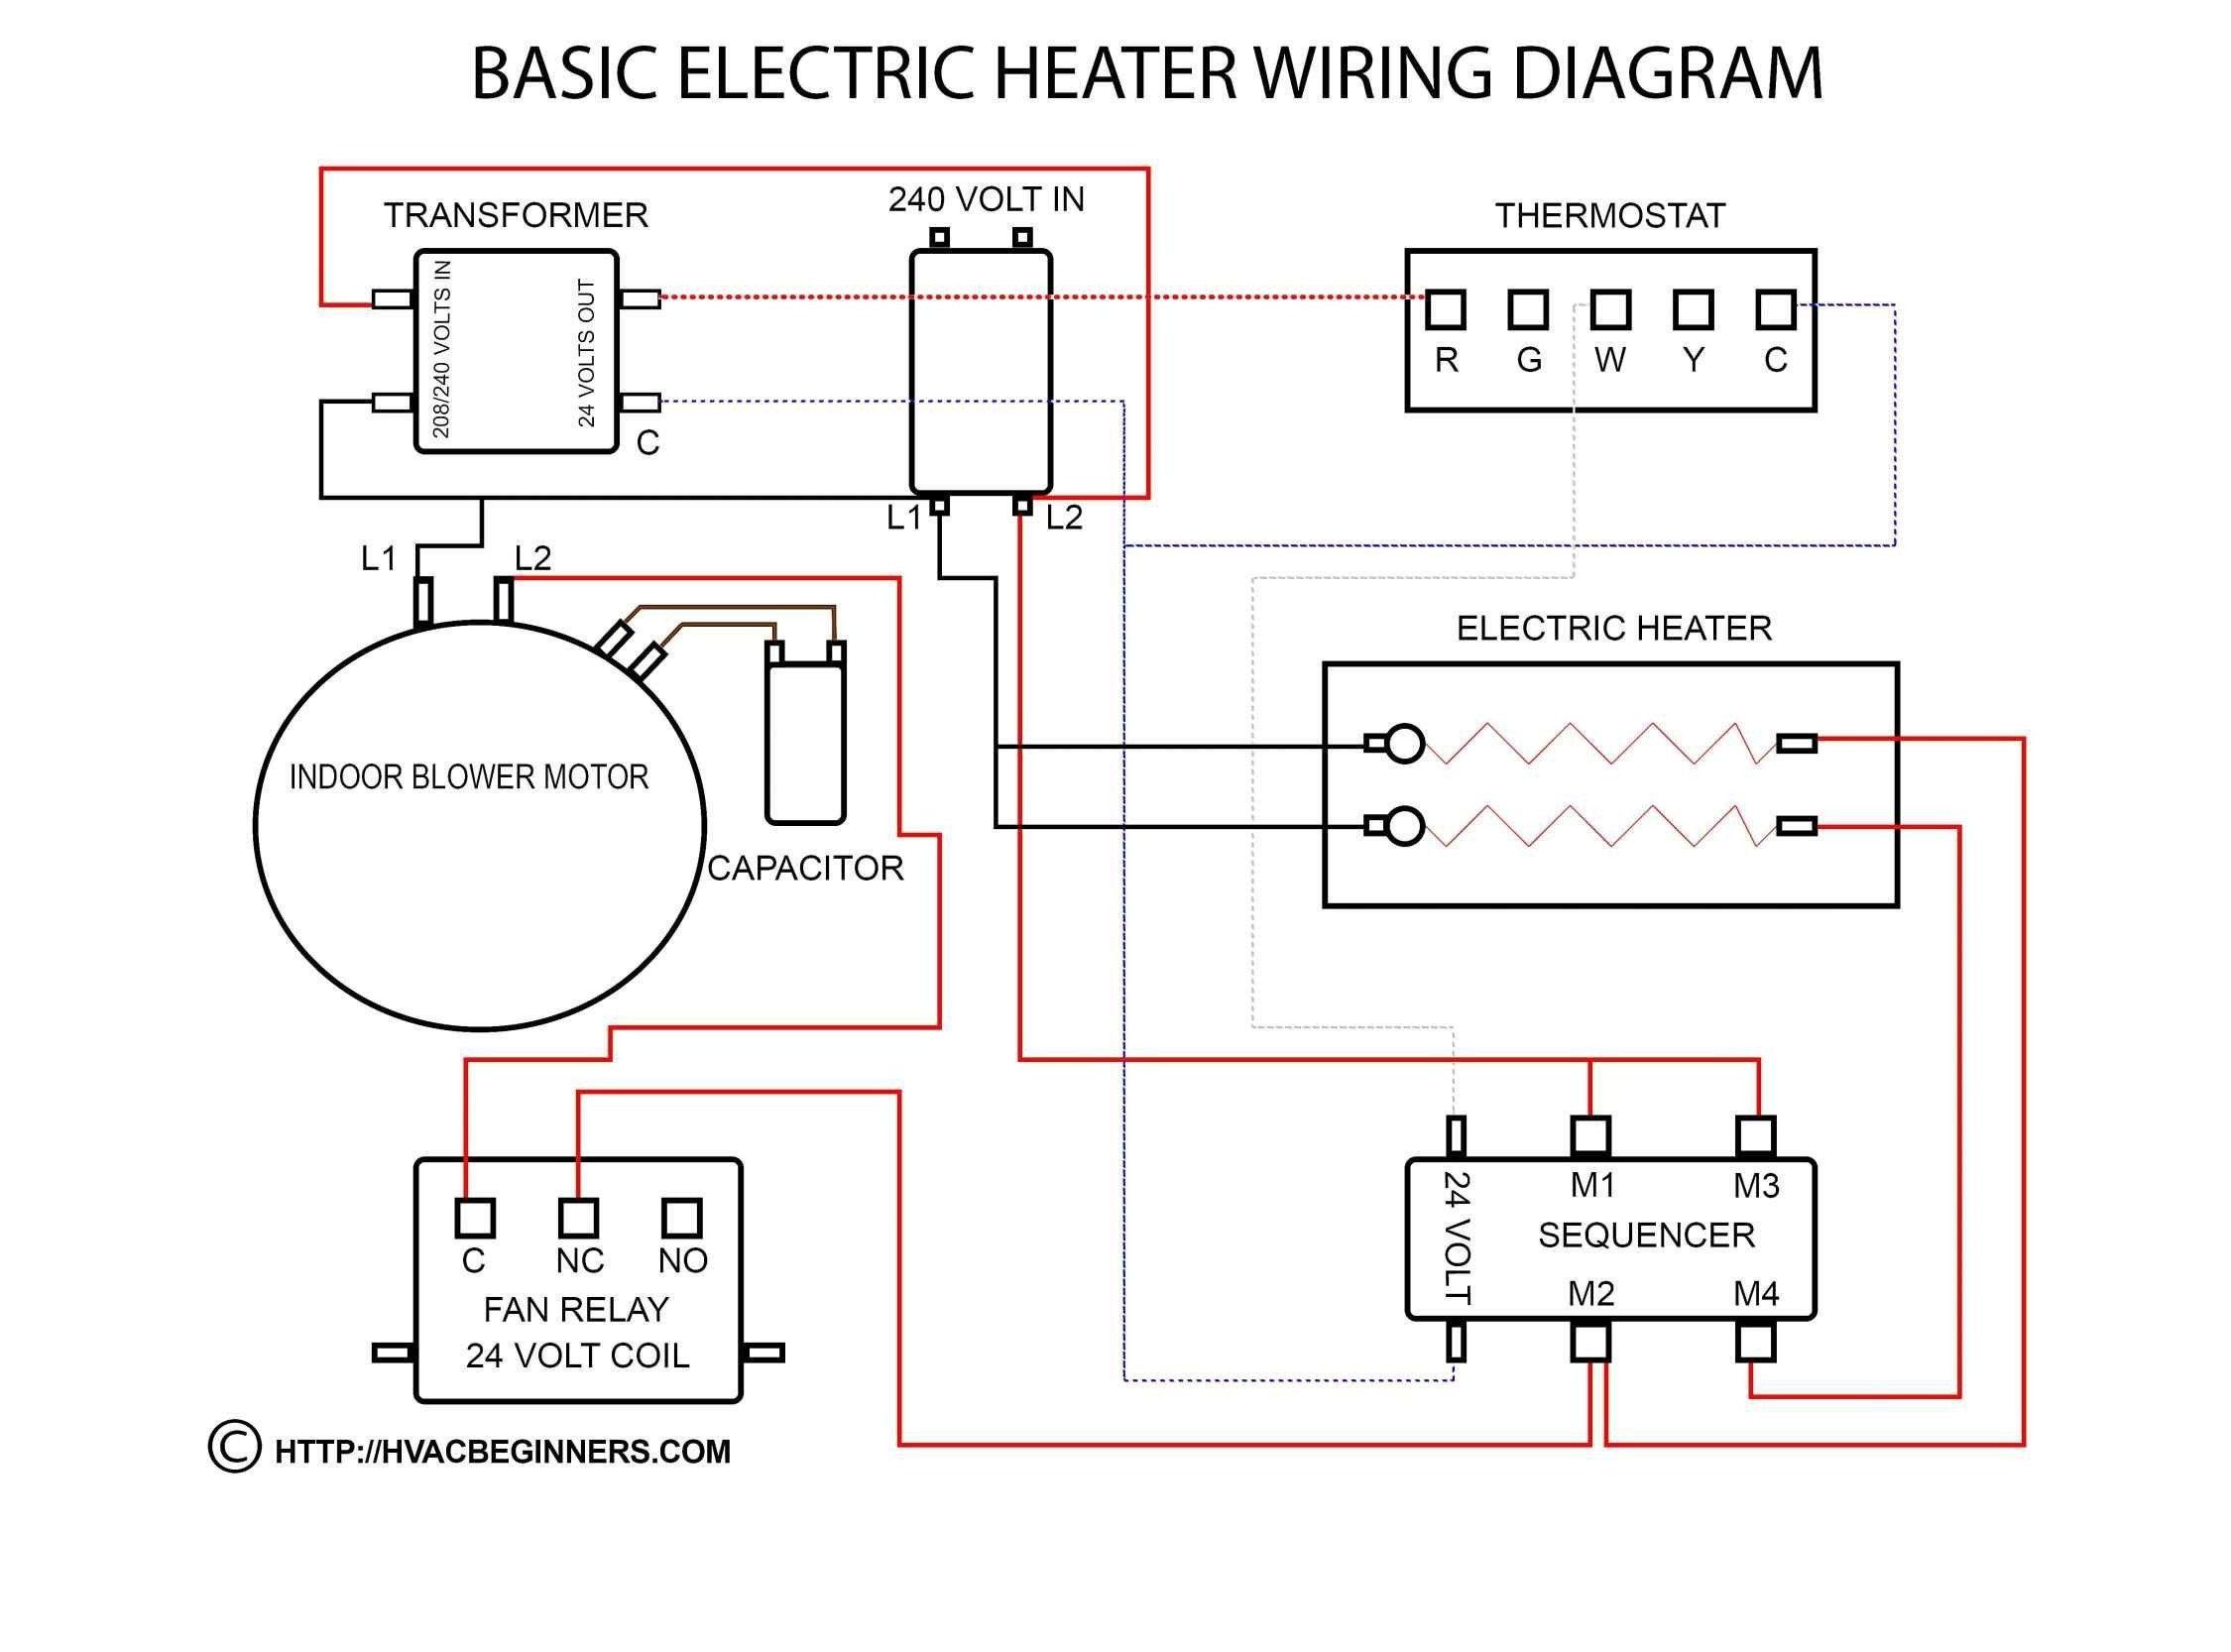 Unique Wiring Diagram Design Sample Free Download Diagrams Digramssample Diagr Electrical Circuit Diagram Electrical Wiring Diagram Diagram Design